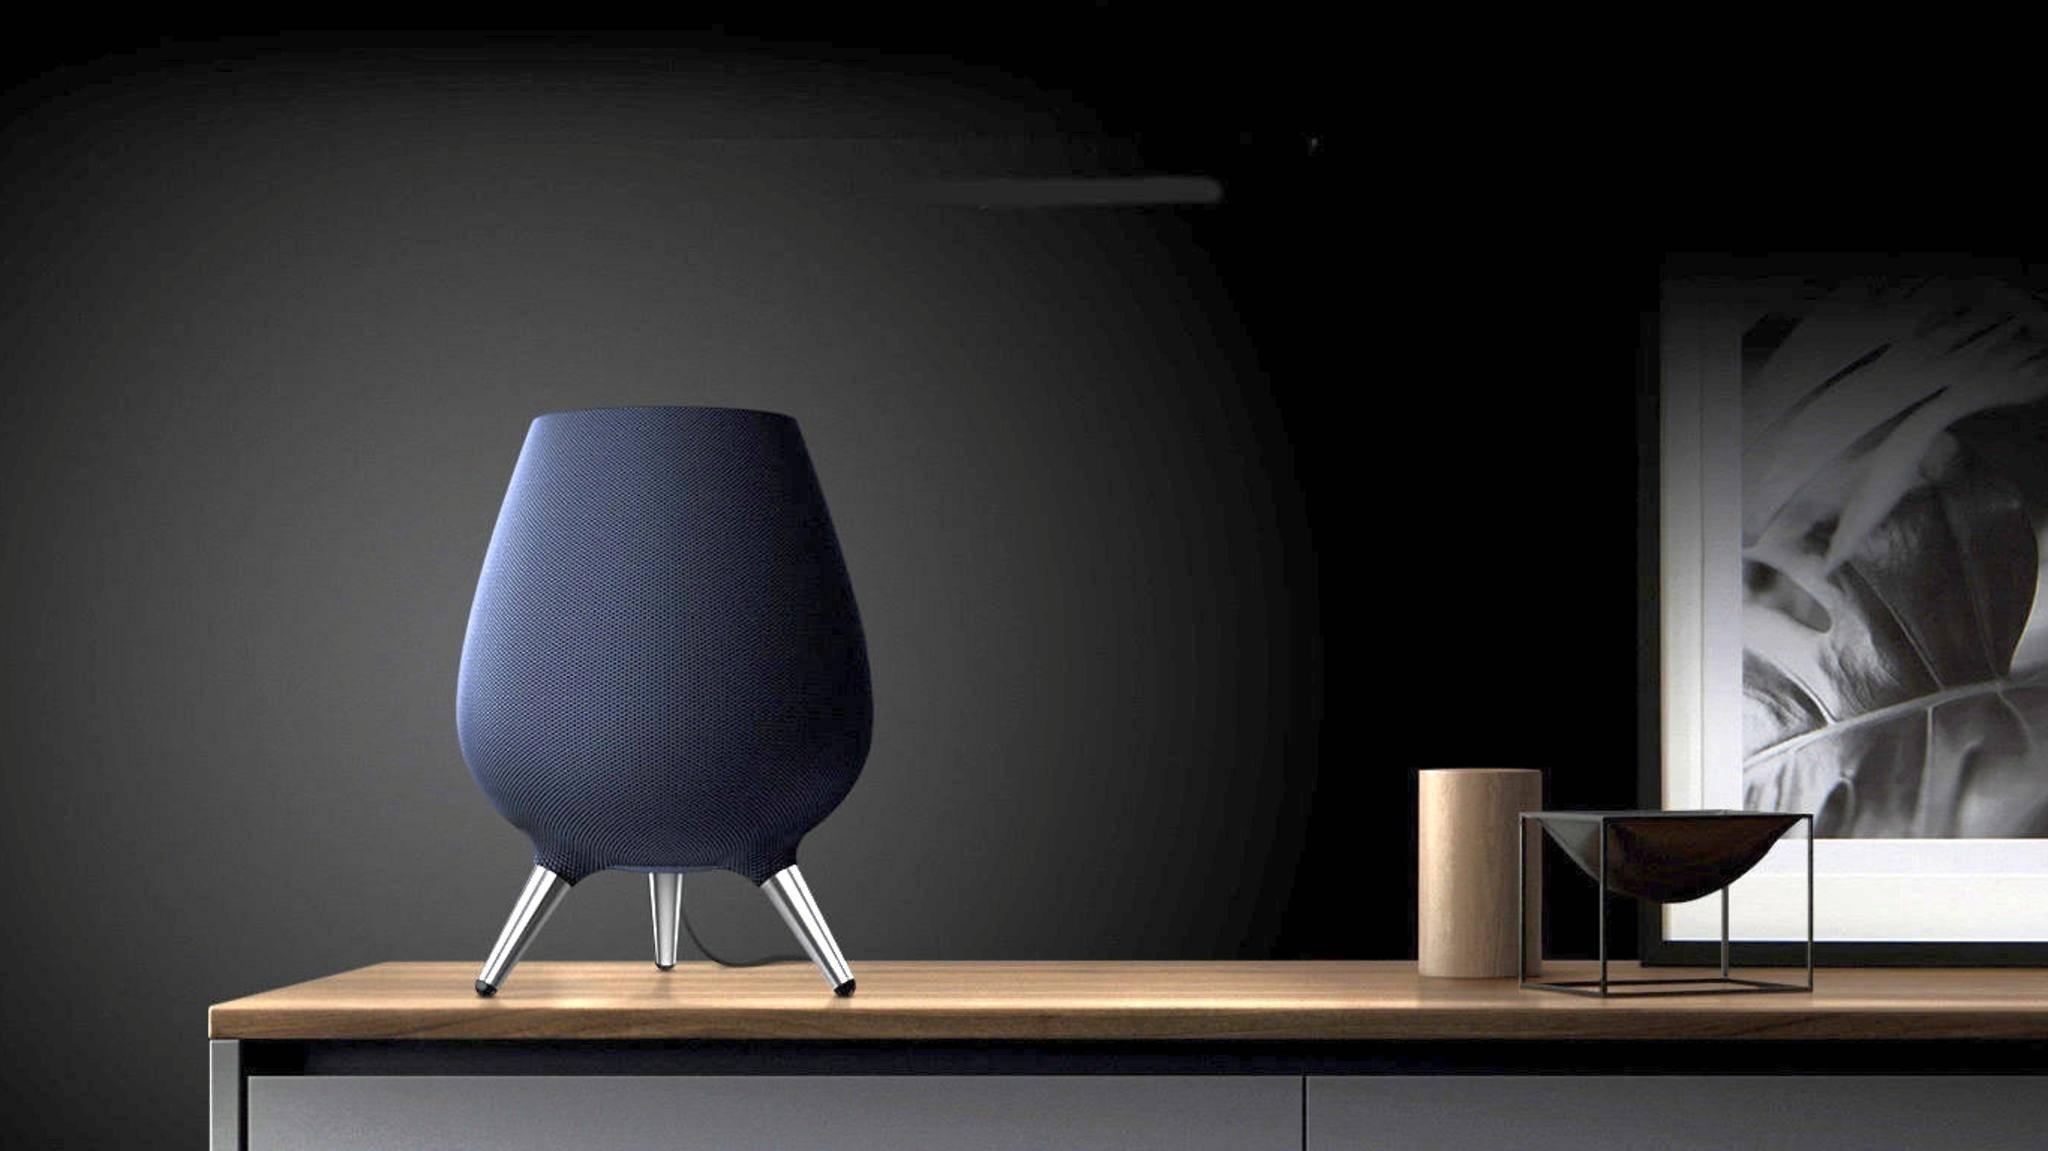 Der Samsung Galaxy Home soll den Apple HomePod herausfordern.